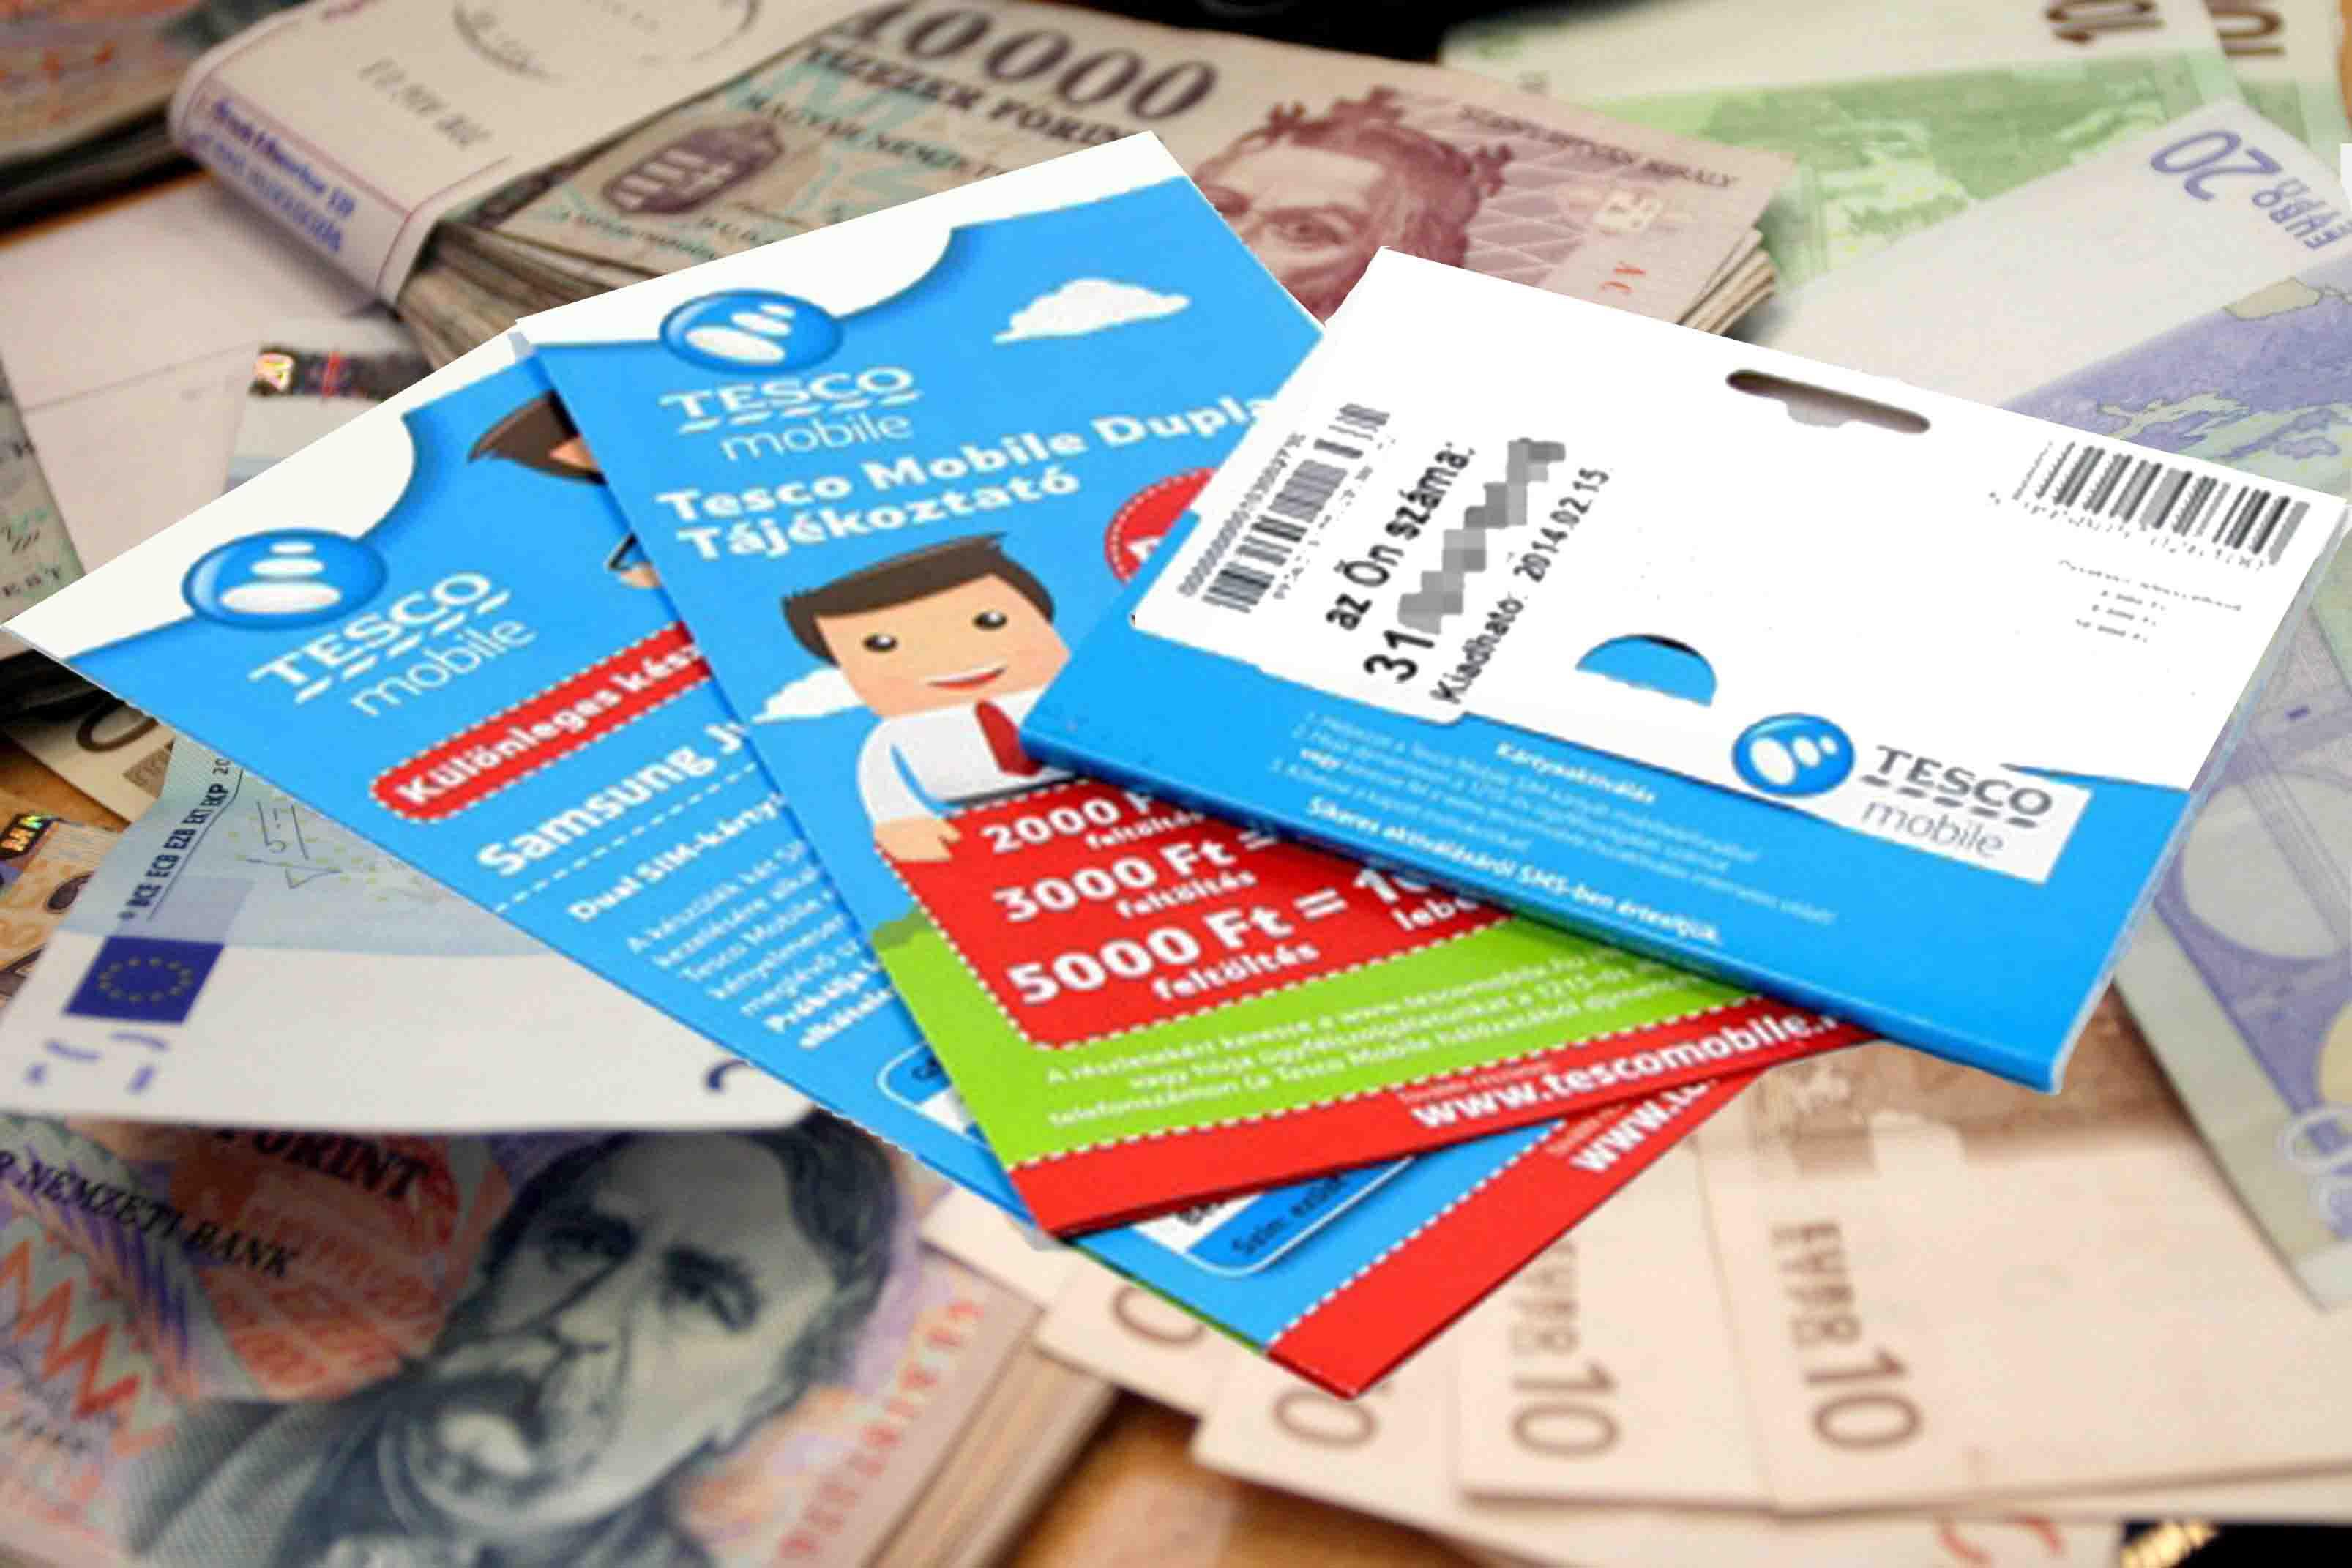 tesco_money